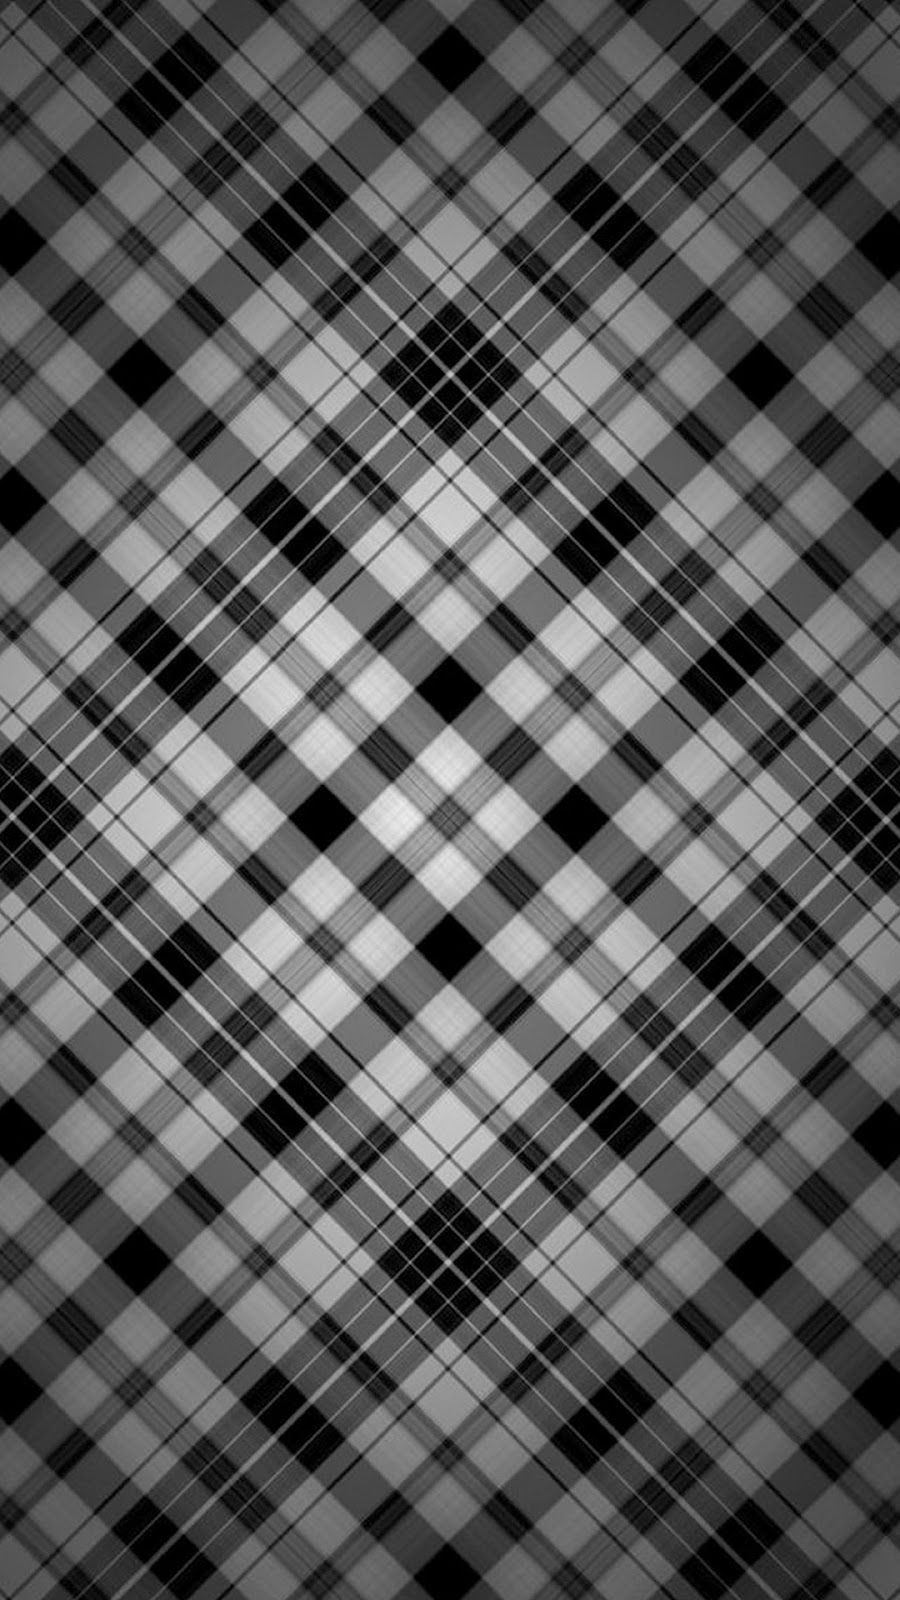 Samsung Galaxy S5 Wallpaper Pattern Black Plaid